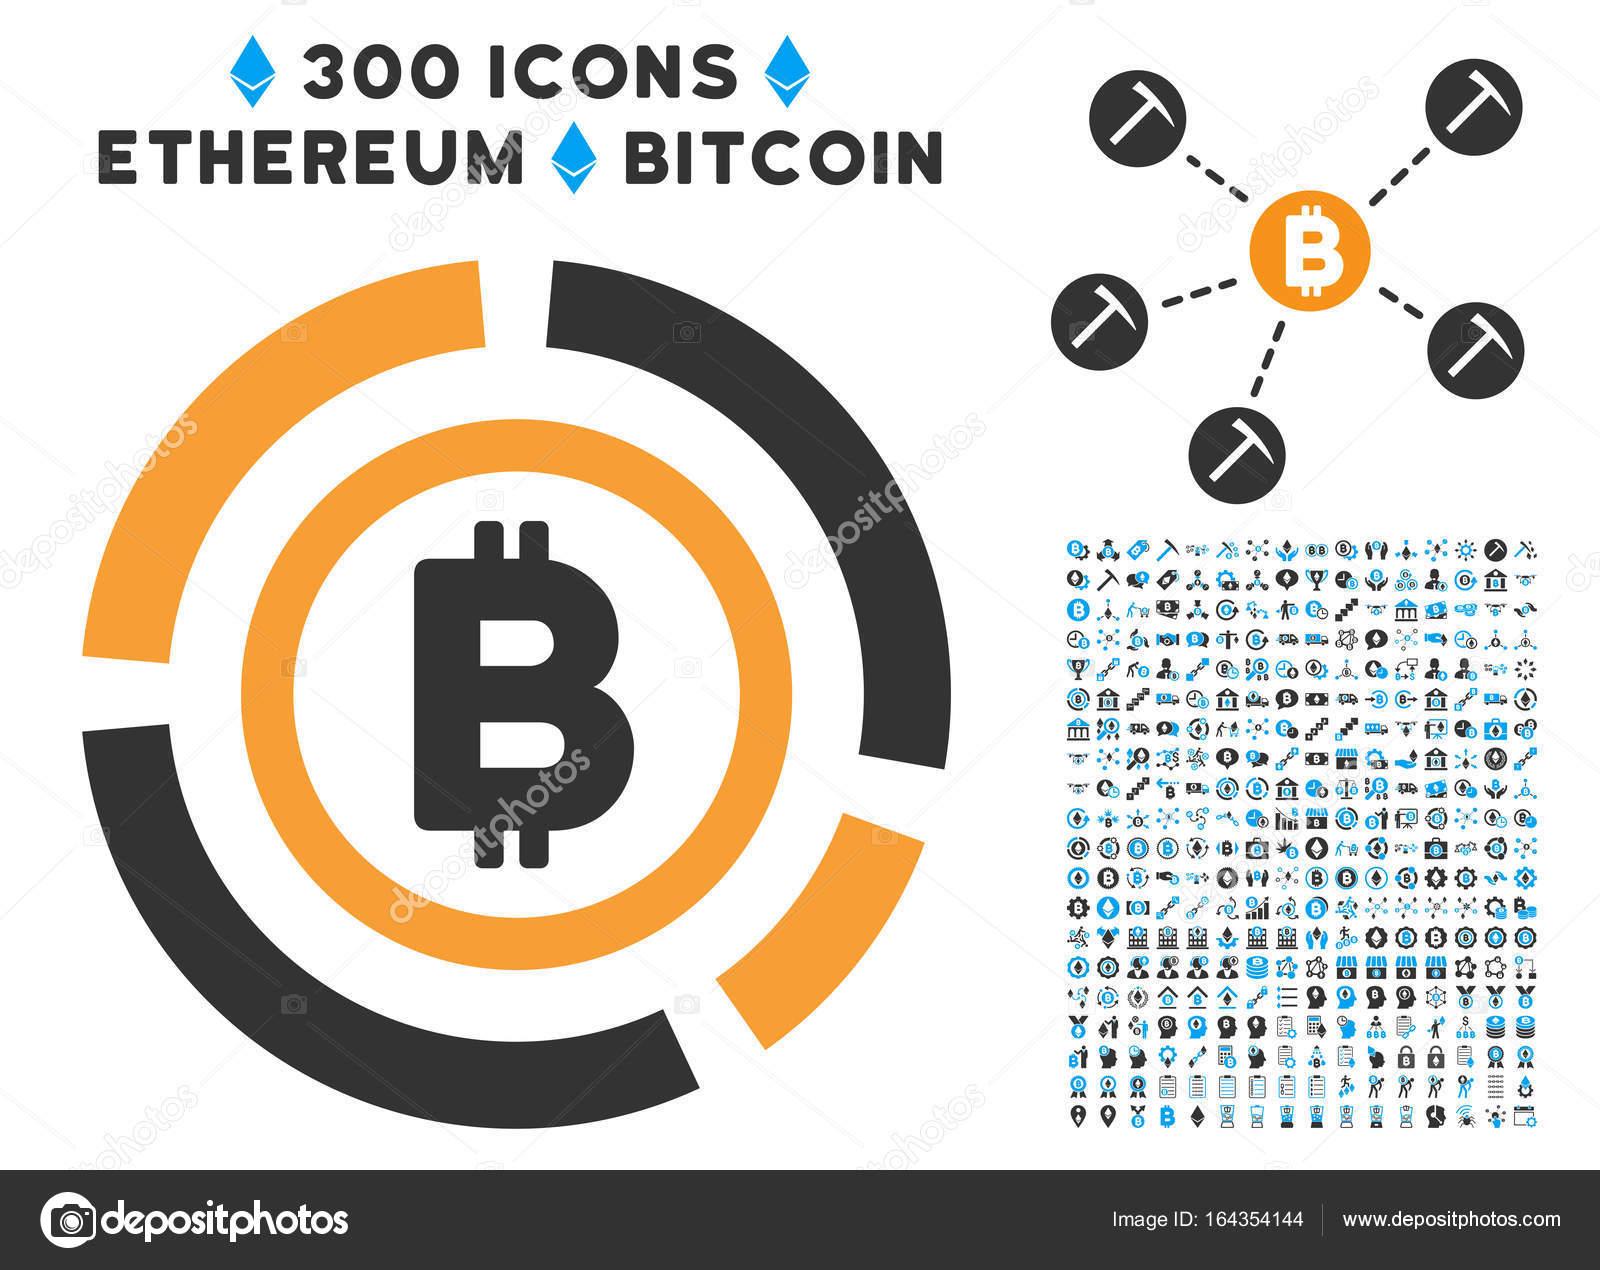 Bitcoin circle diagram flat icon with clip art stock vector bitcoin circle diagram flat icon with clip art stock vector ccuart Choice Image